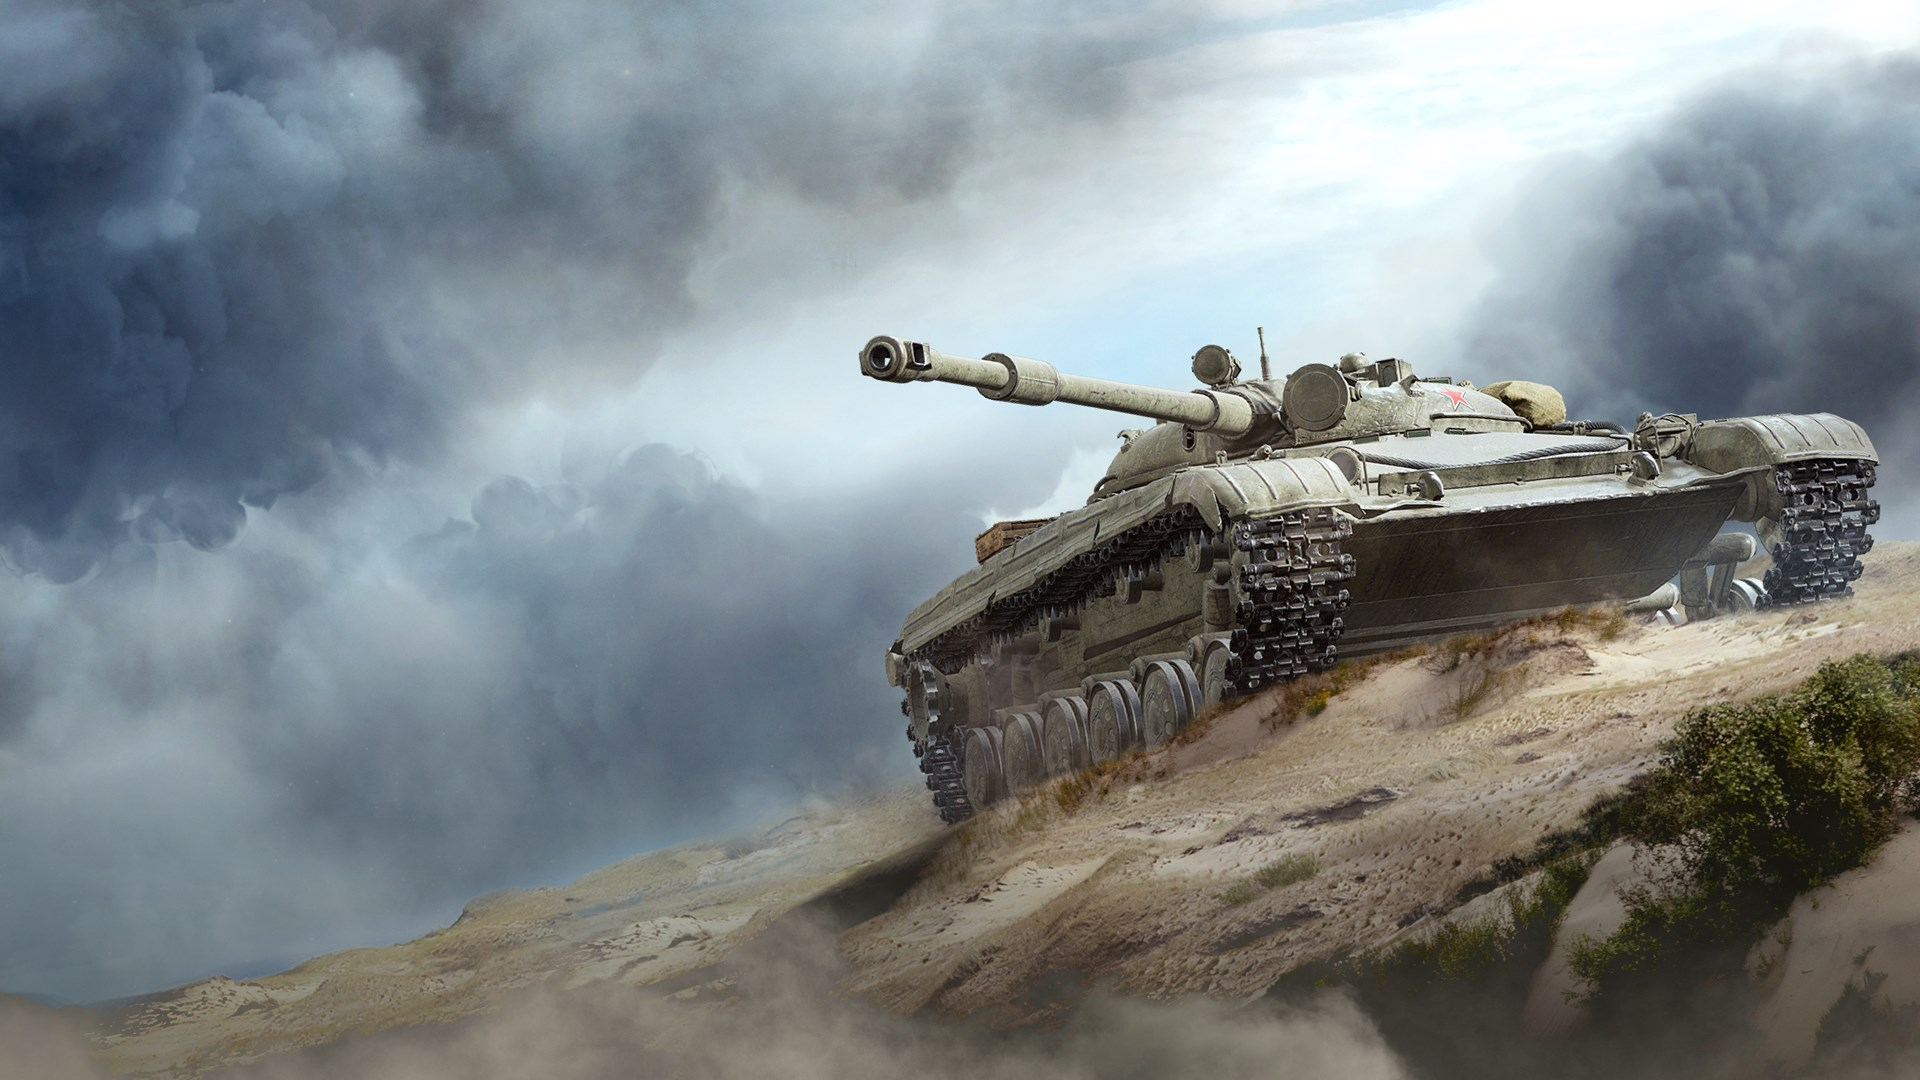 World of Tanks - LT-432 Ultimate